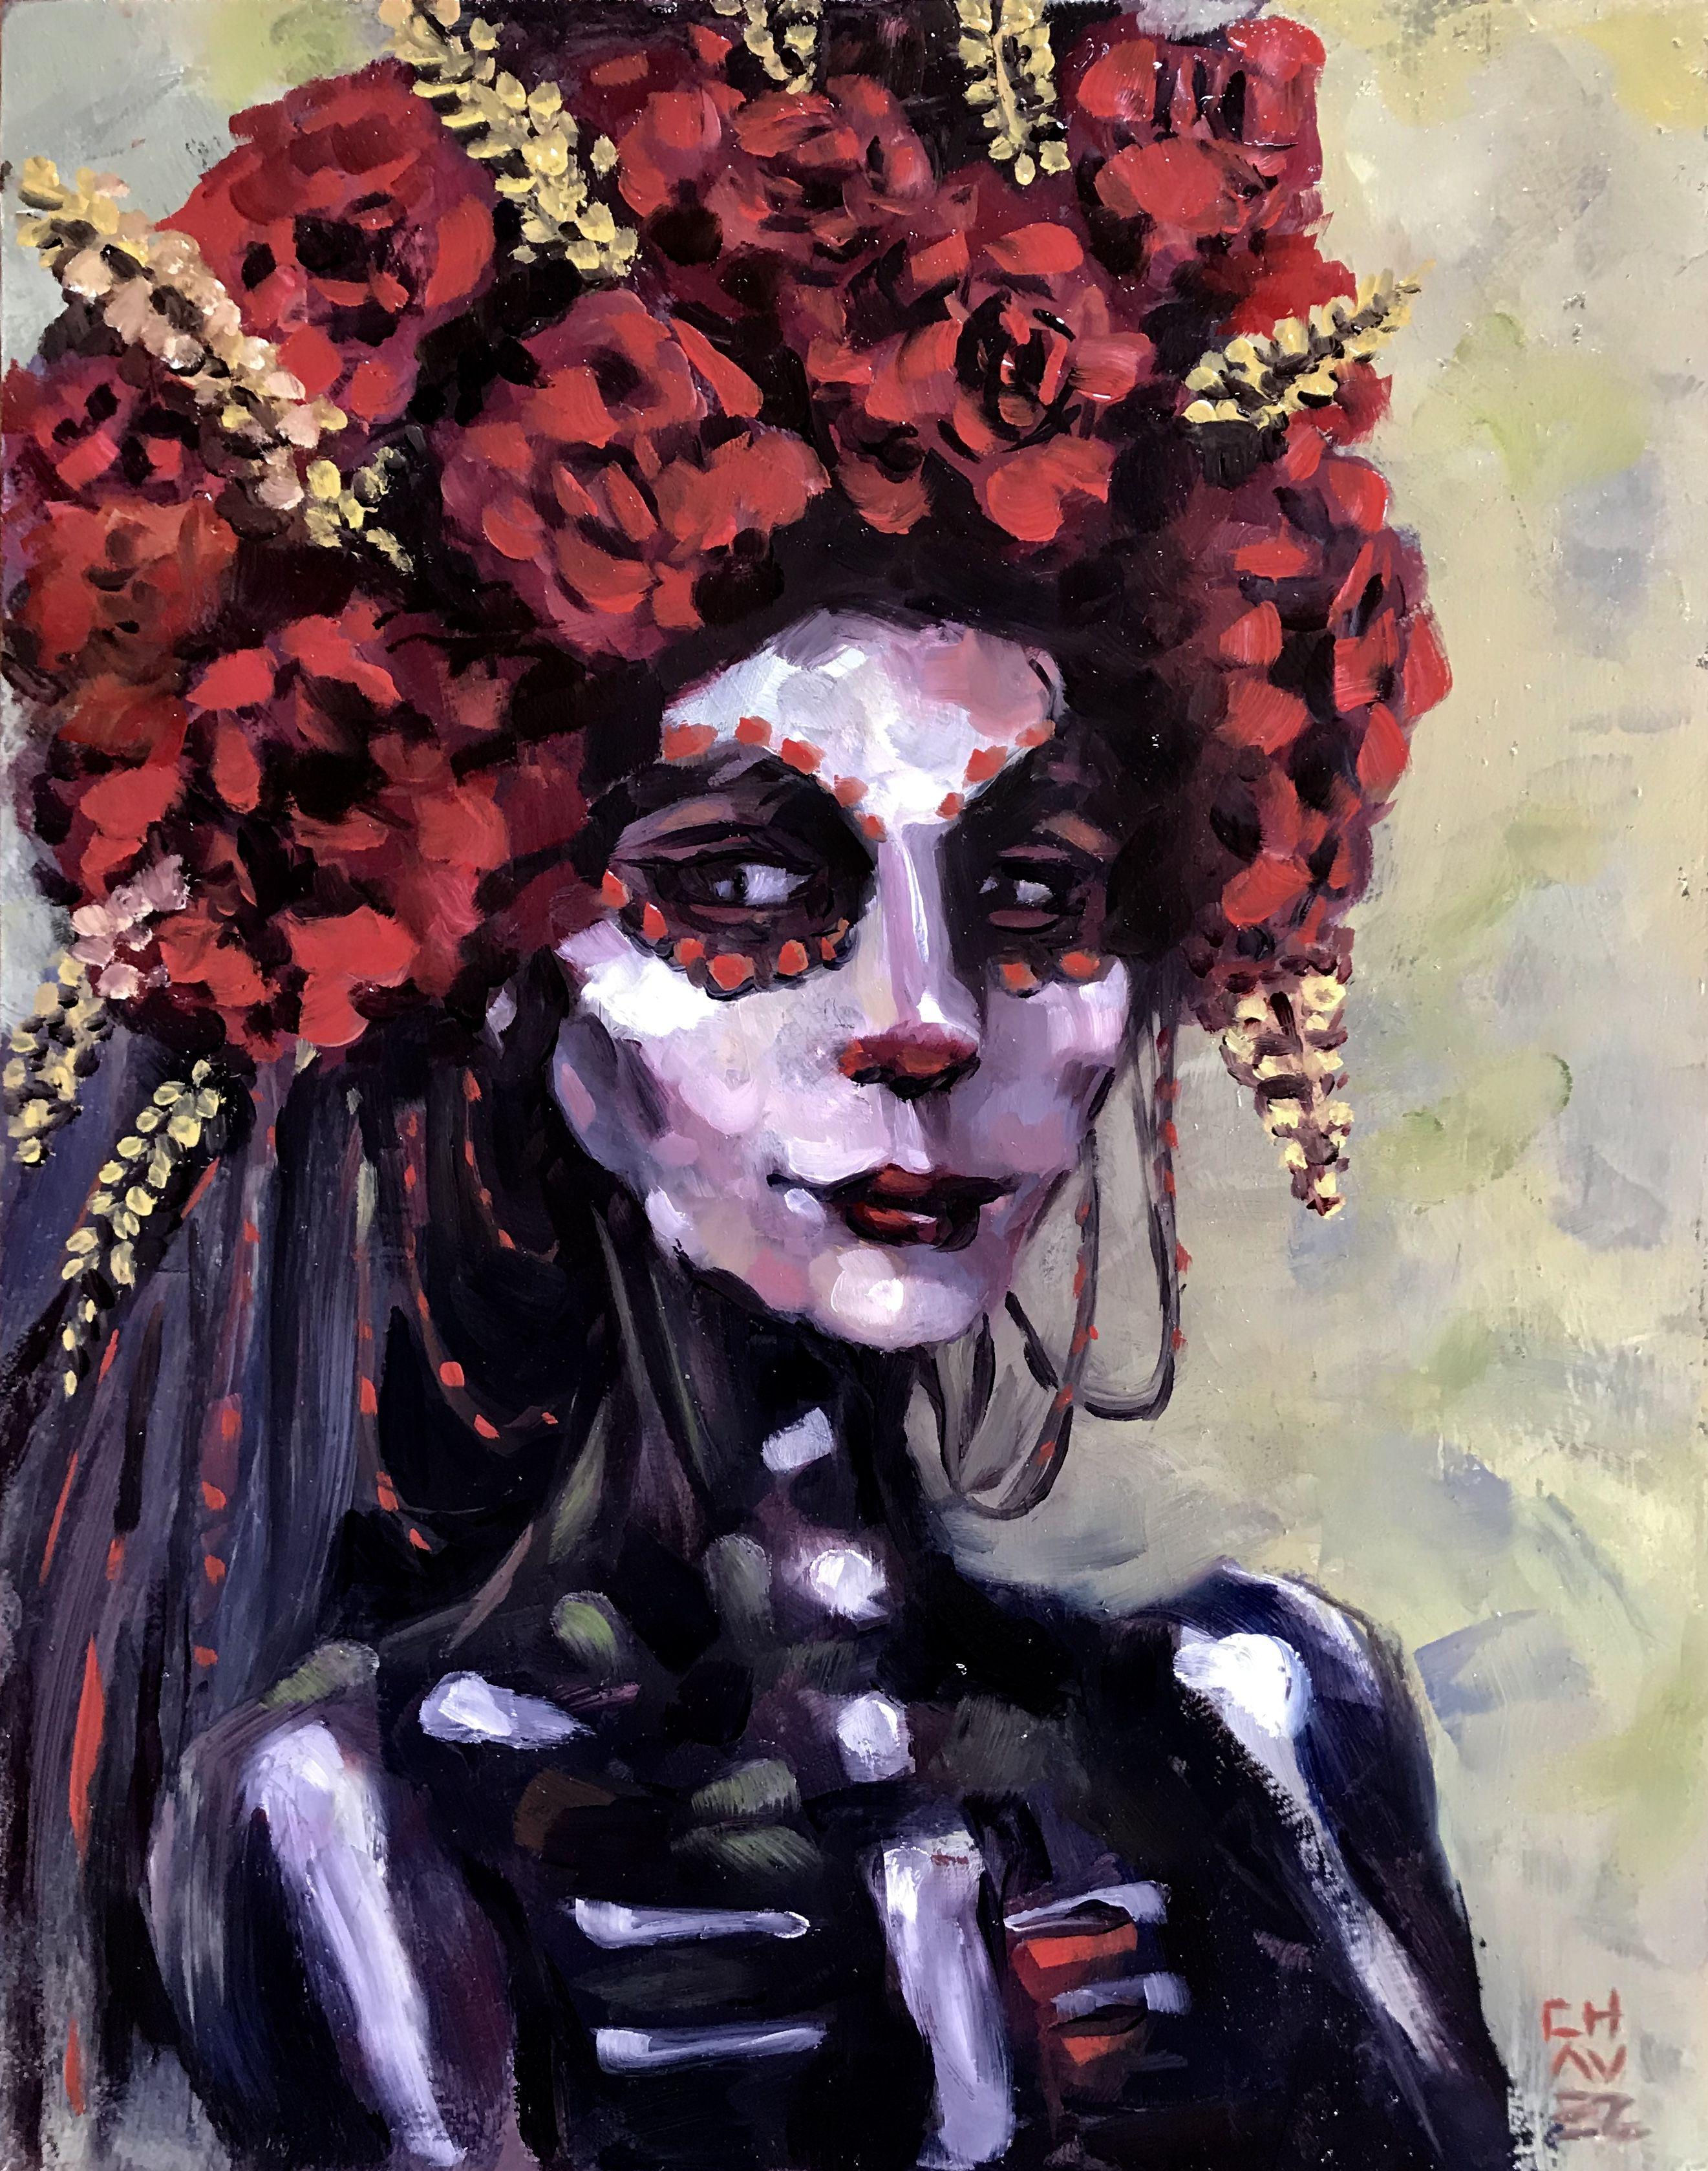 Boheim small print alex chavez artist original oil